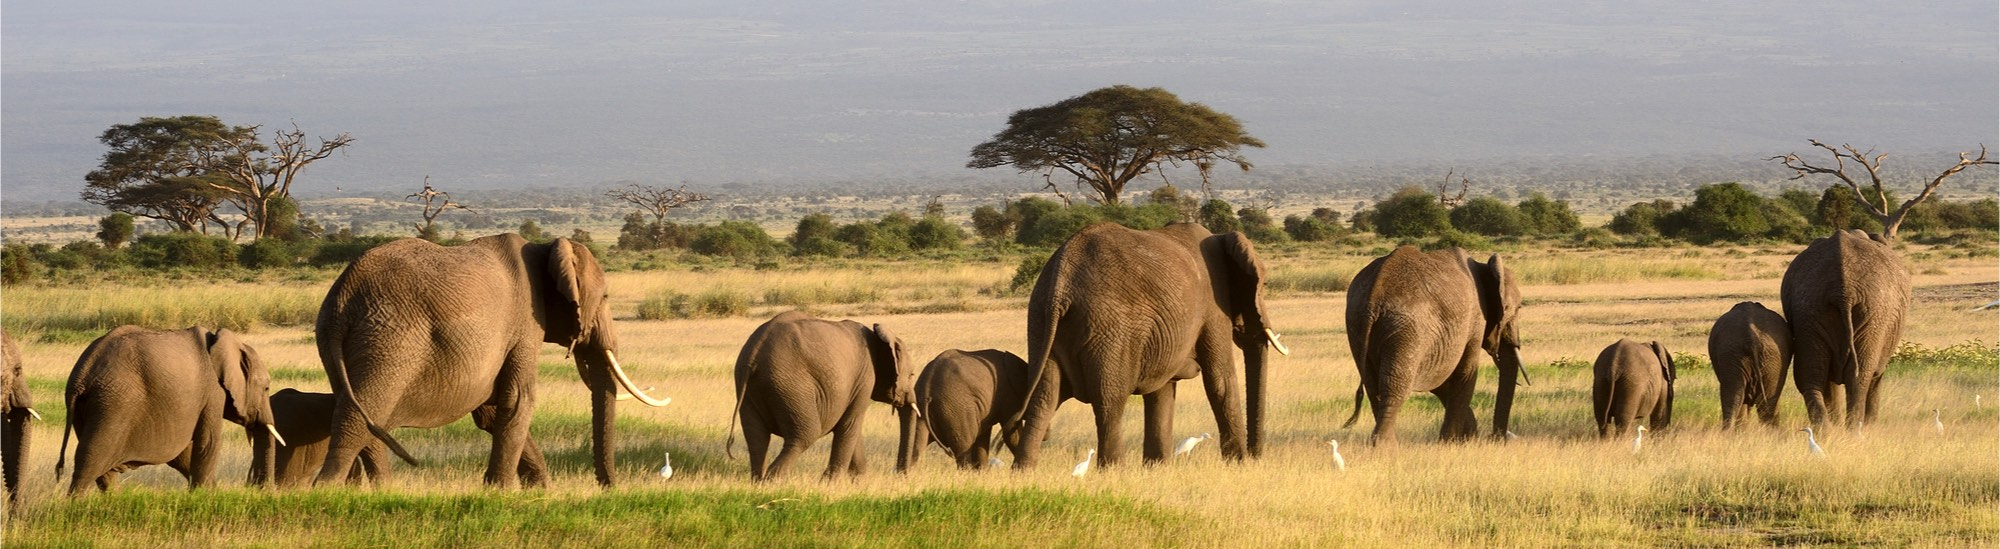 Afrika | Kenia | ©Attila Jandi/Shutterstock.com